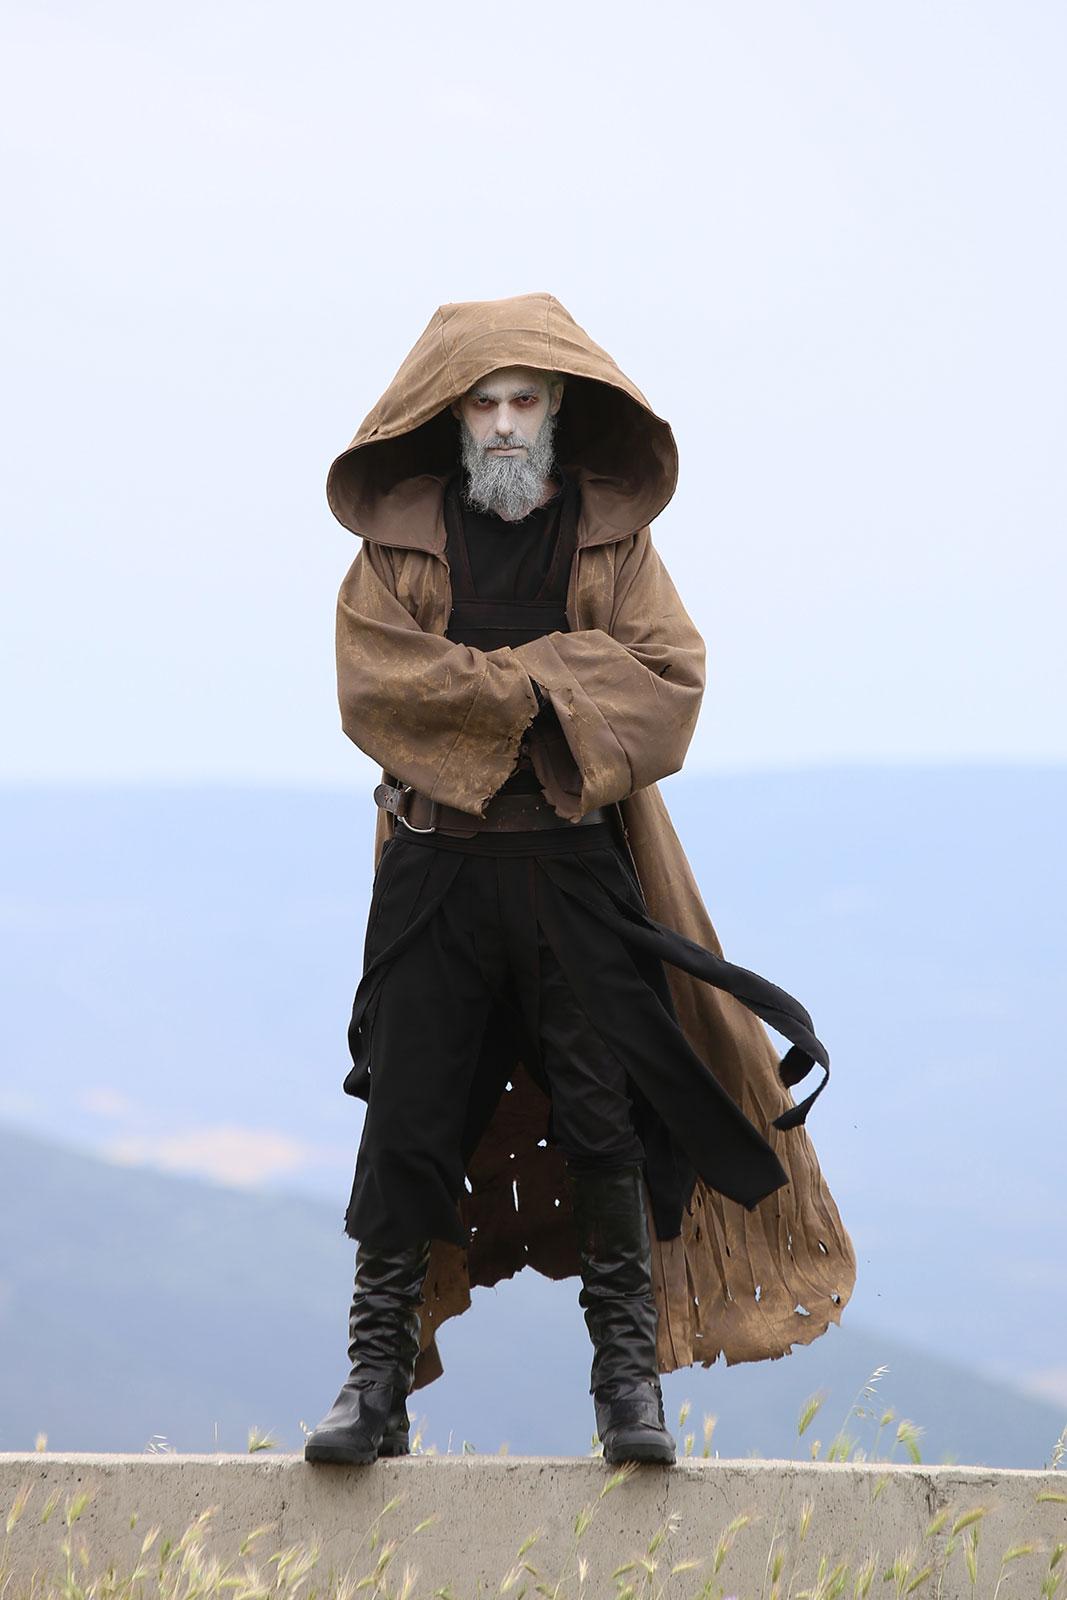 Dionisis Combothecra Kompotheklas - Epsilon Custom Sabers - Actor, Costume & Prop Making